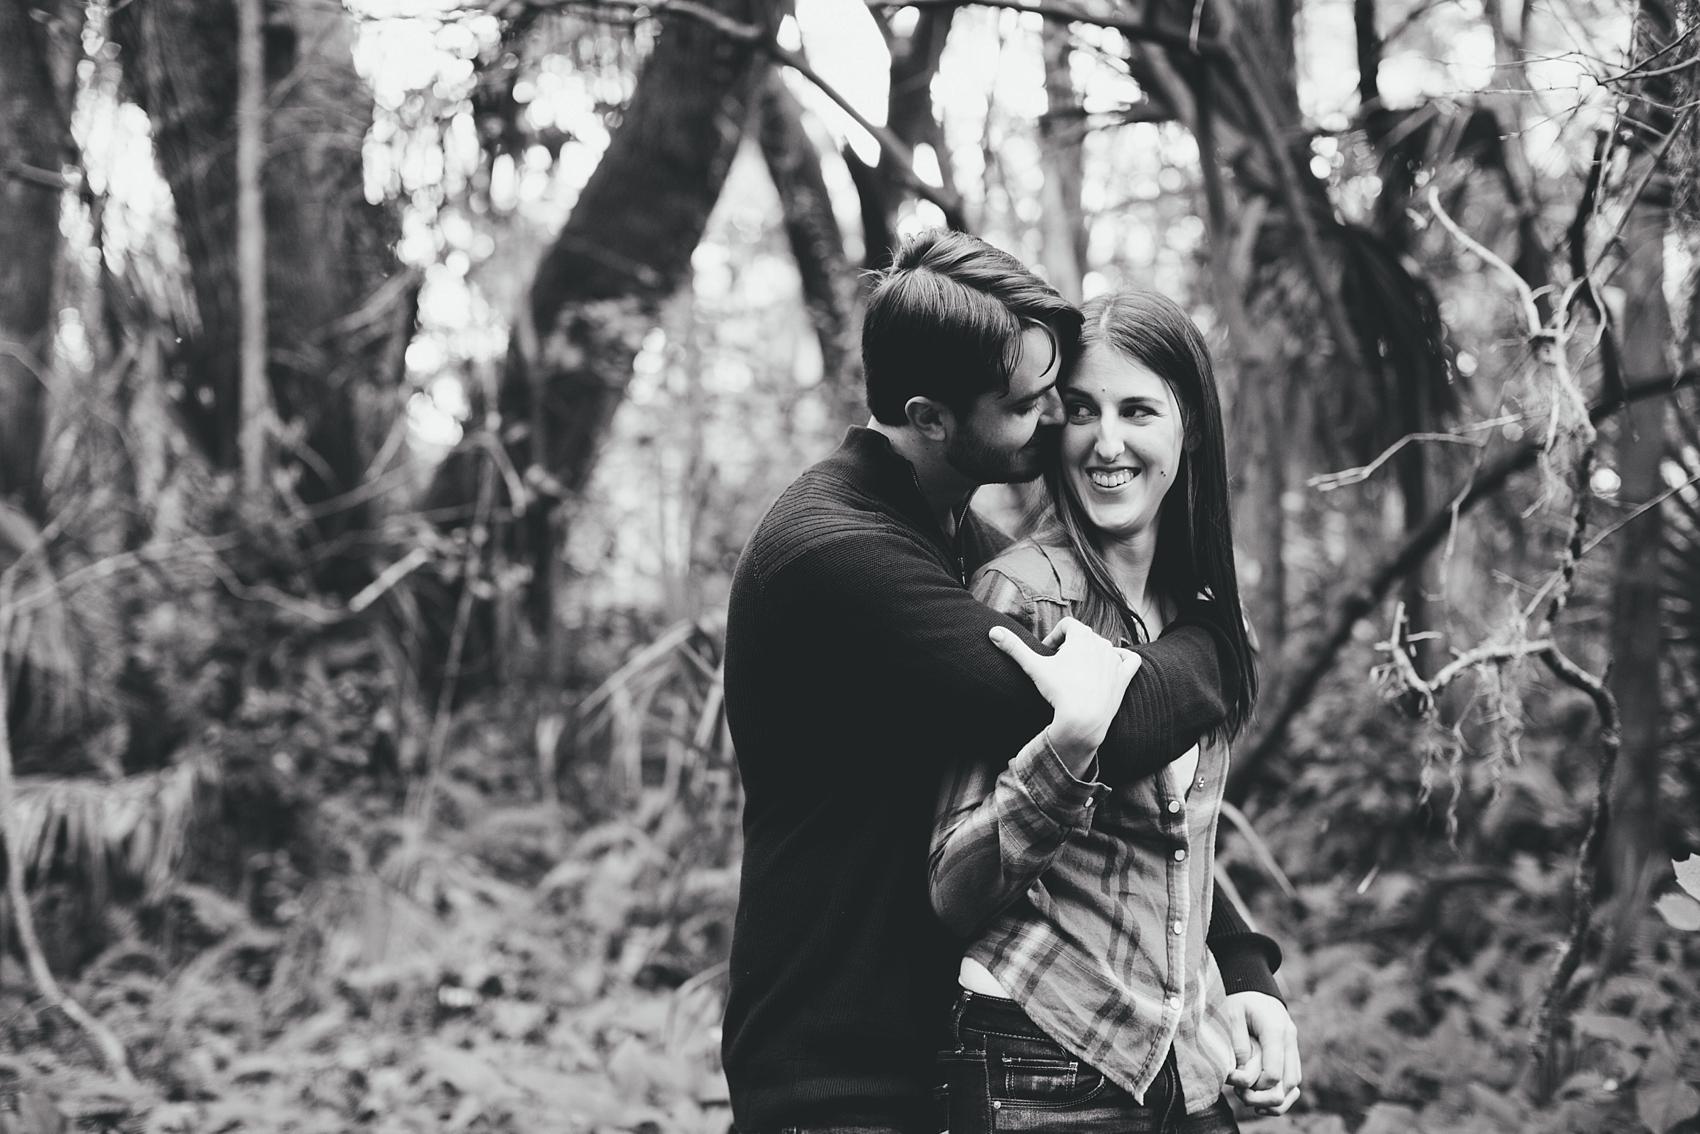 Jake & Katie Photography Seminole Heights Engagement Photos David & Cailyn-005.jpg